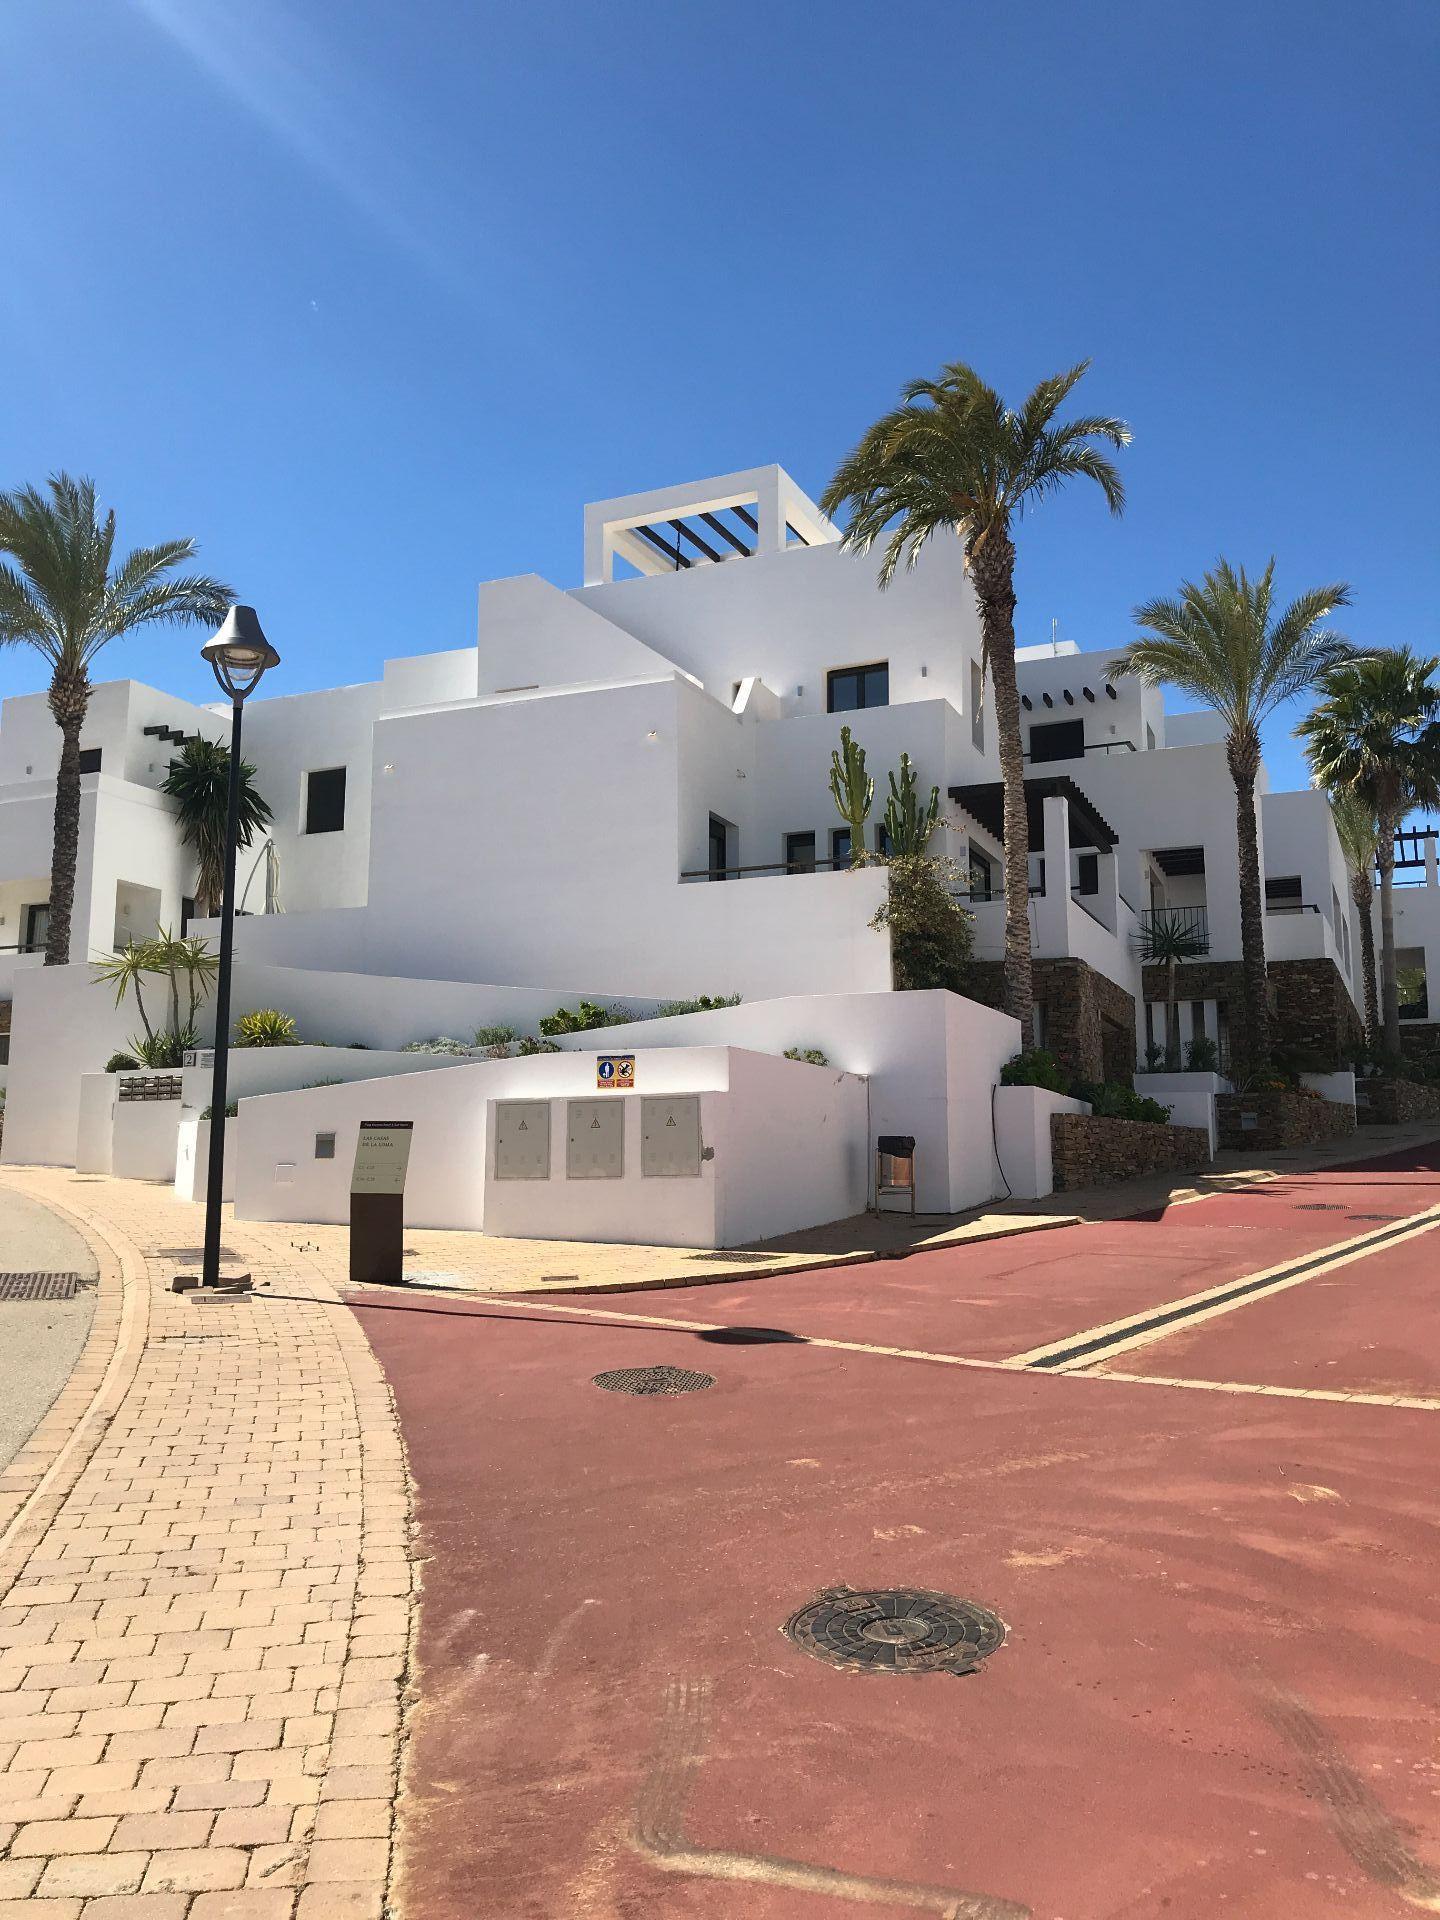 Casa / Chalet en Mojácar, Macenas (playa), alquiler vacacional